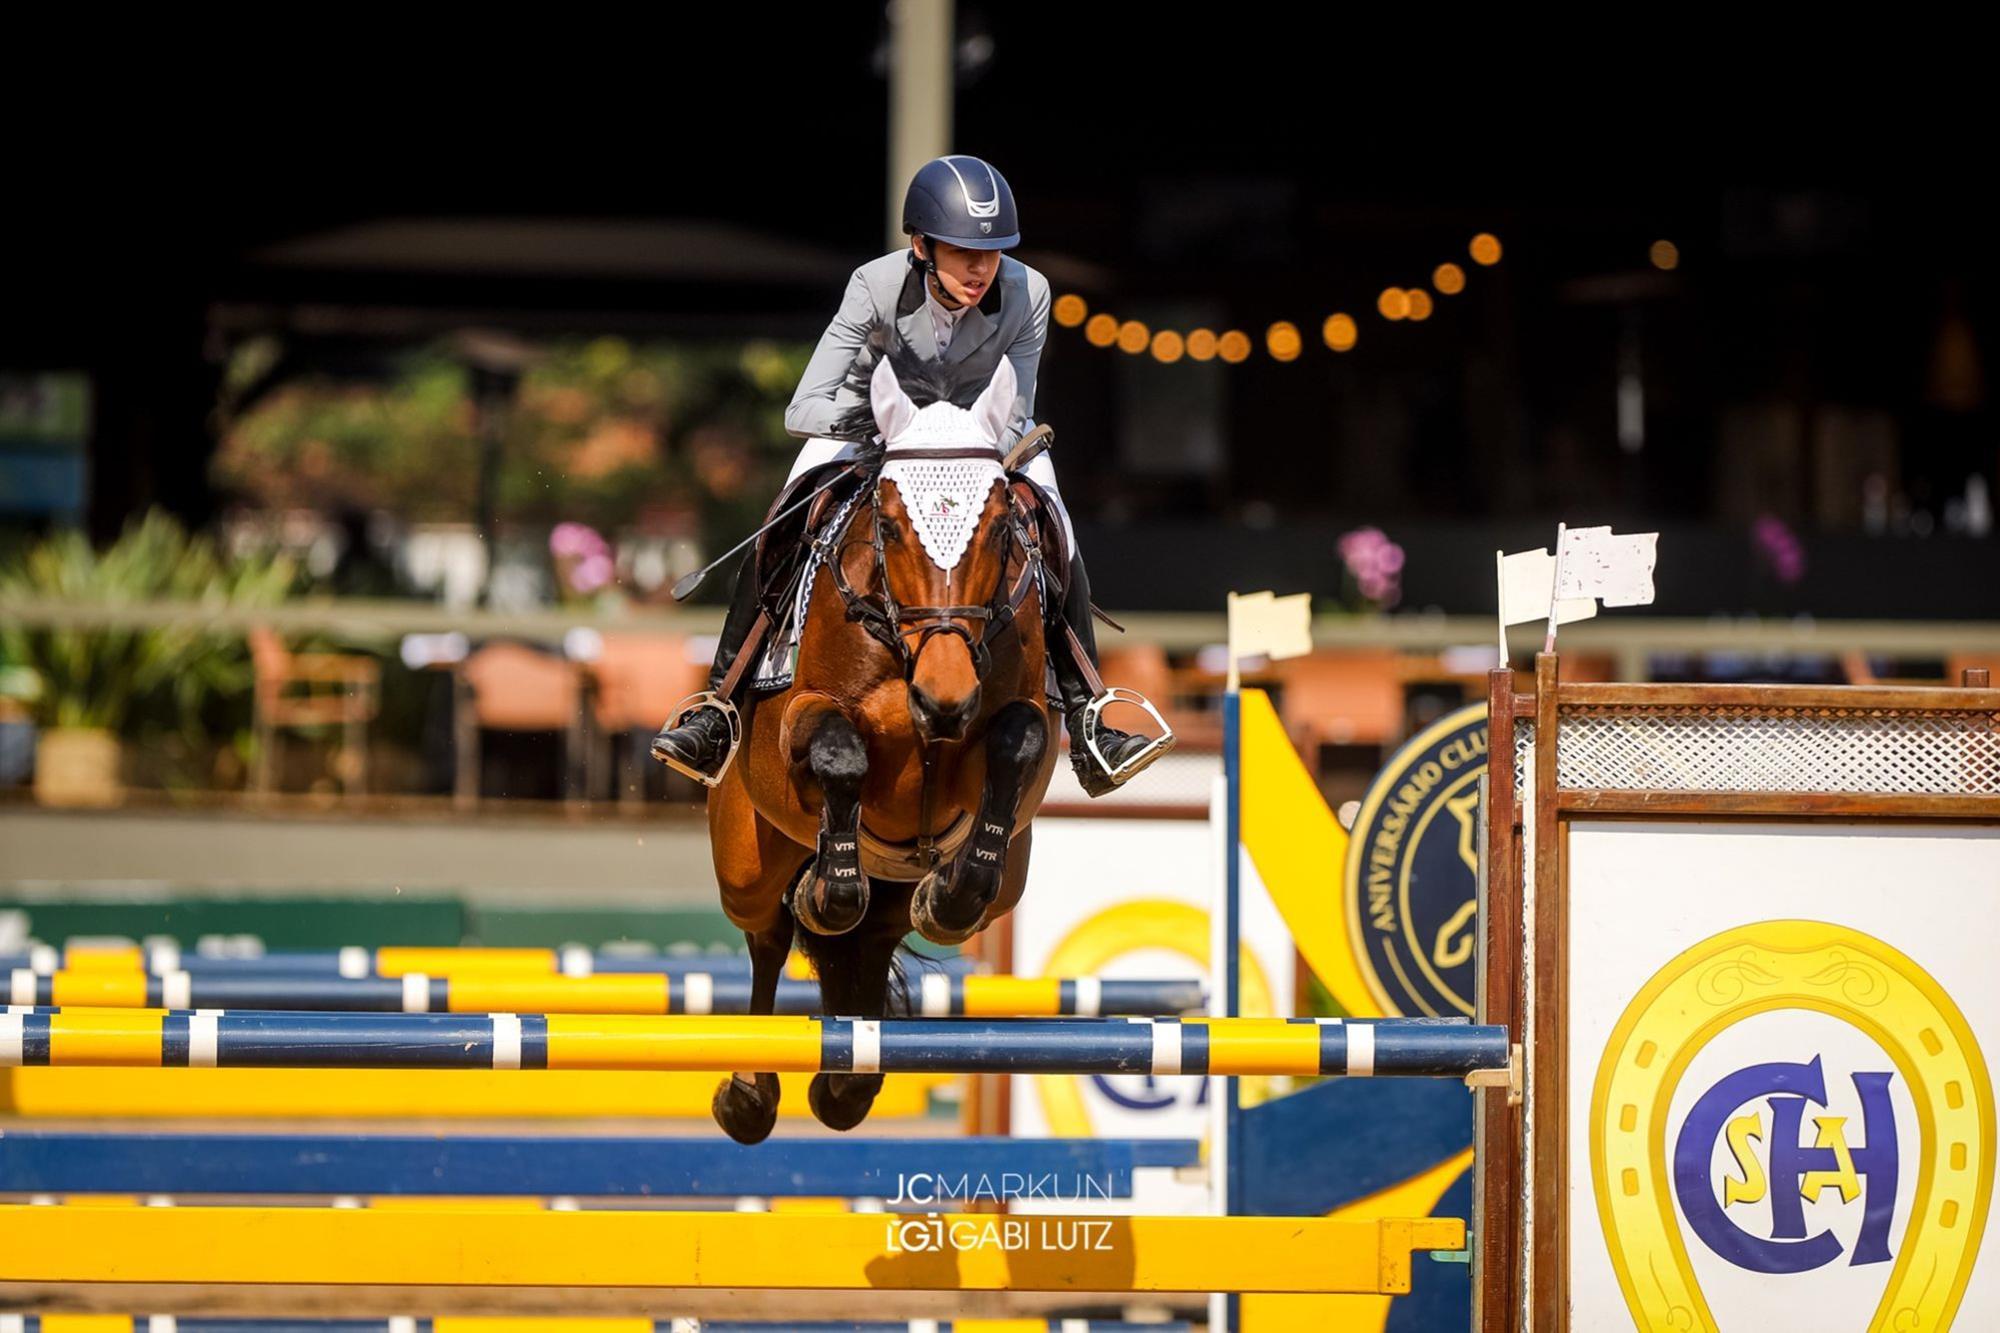 Nina Storrer Müller e Lady Flores  , Hipismo,  juventude,  cavalo,  salto, JC Markun, Irmãs conquistam o Campeonato Brasileiro da Juventude de Salto